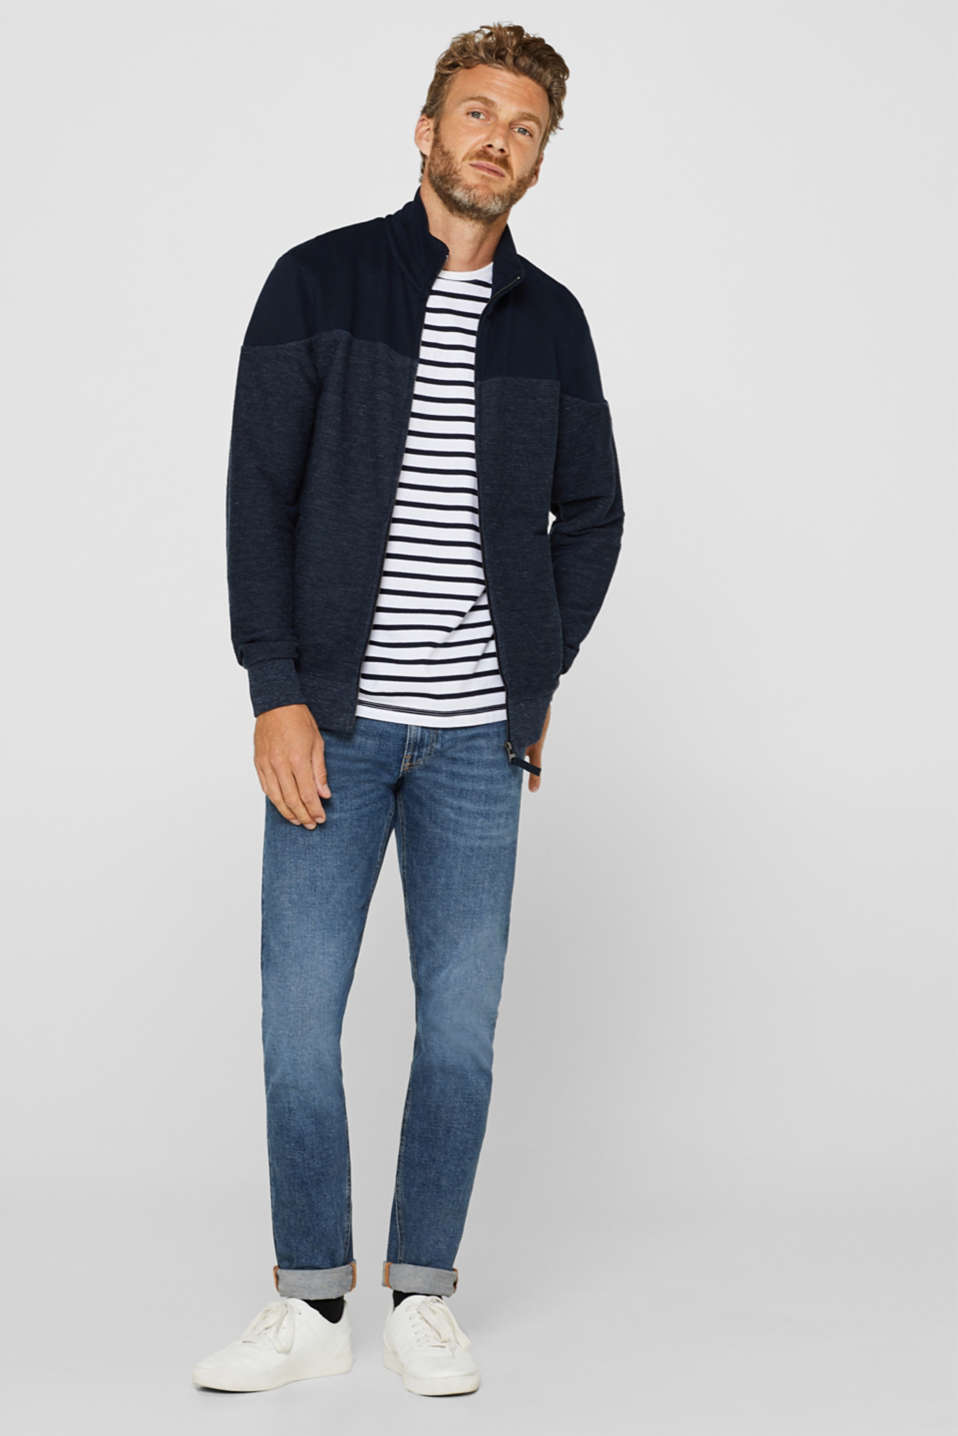 Sweatshirt cardigan with organic cotton, NAVY, detail image number 1